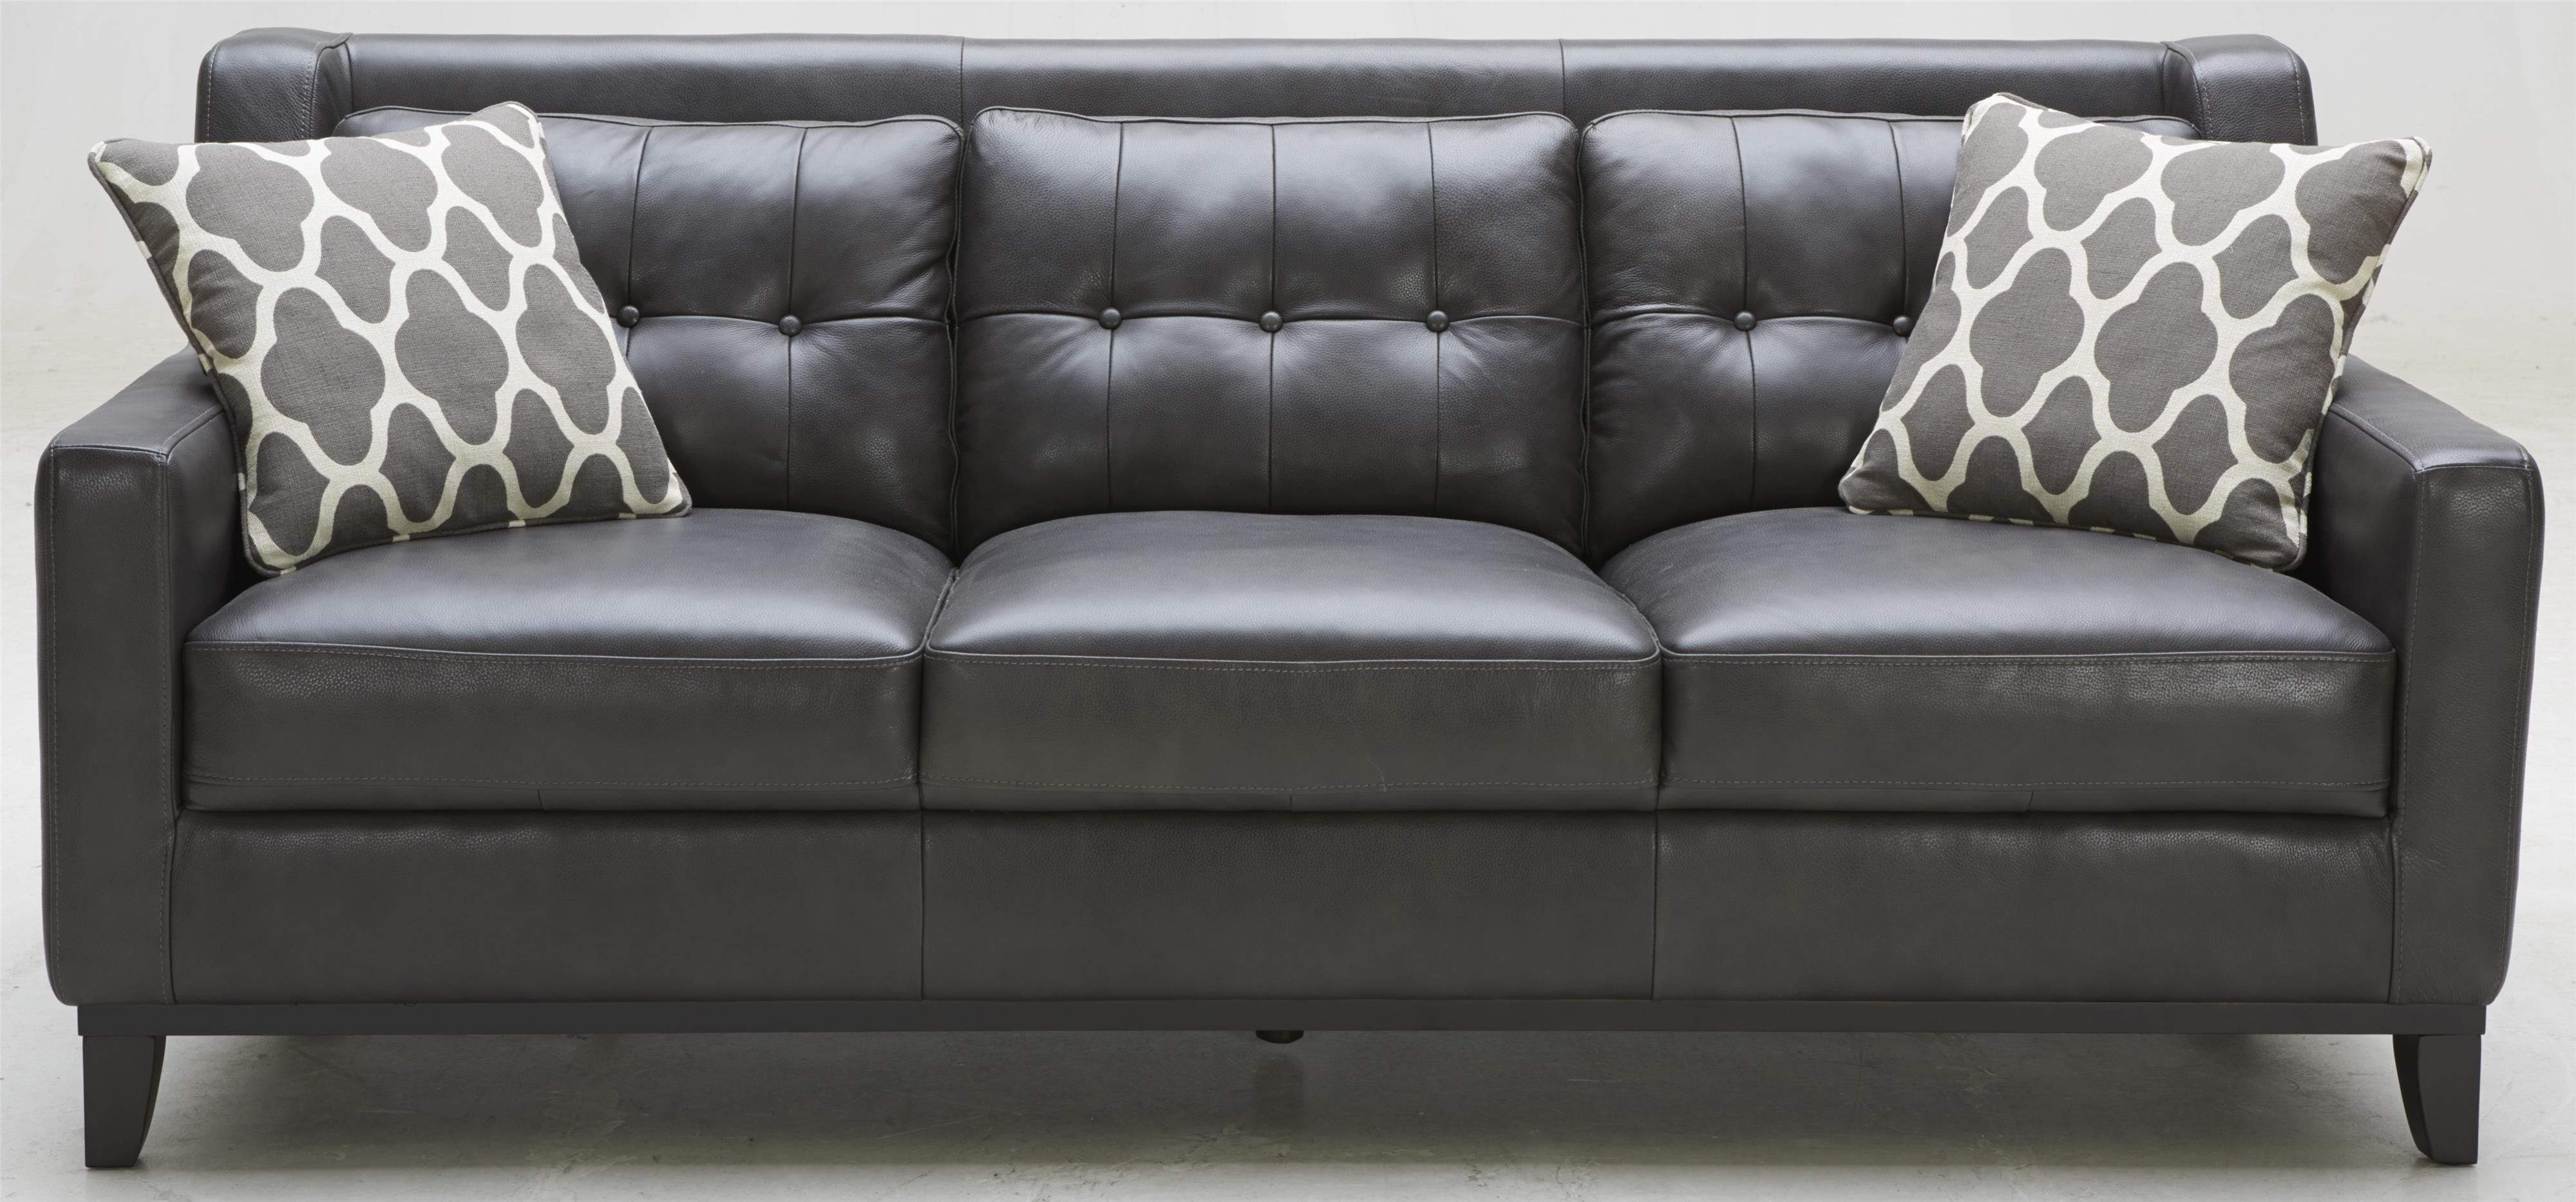 1838 Sofa by Warehouse M at Pilgrim Furniture City